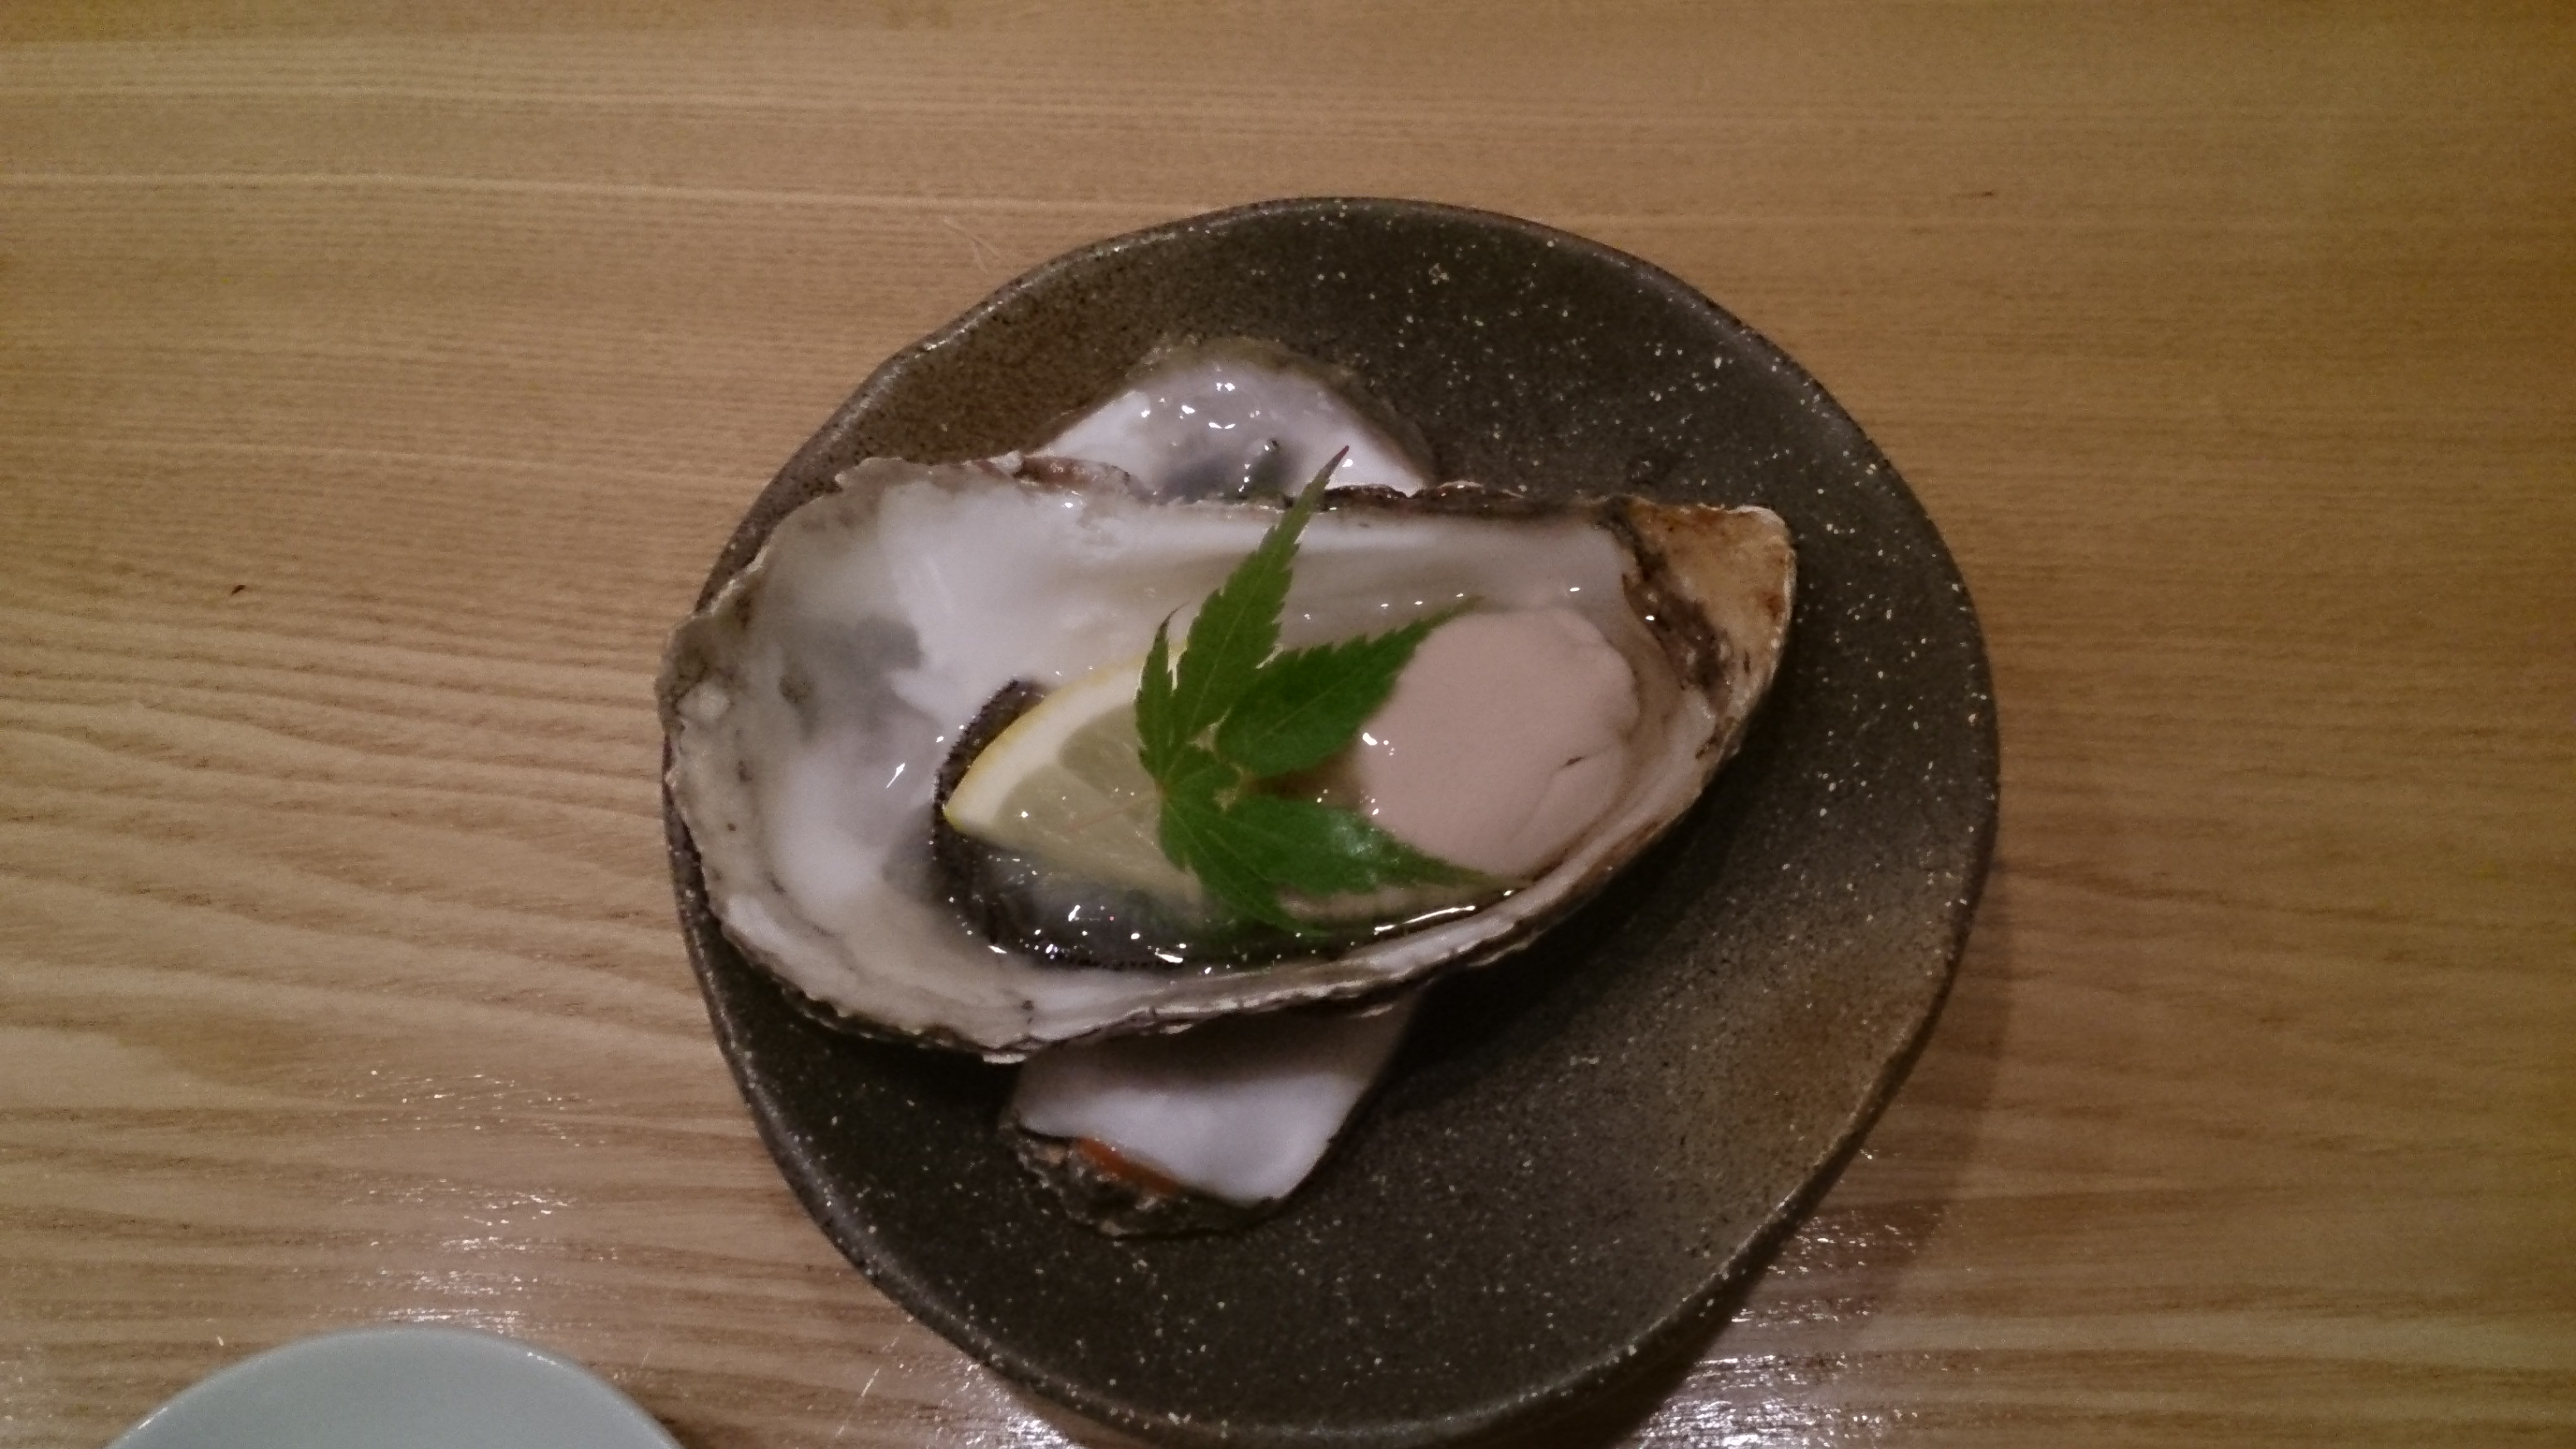 http://www.washin-optical.co.jp/blog/ladies/1.jpg